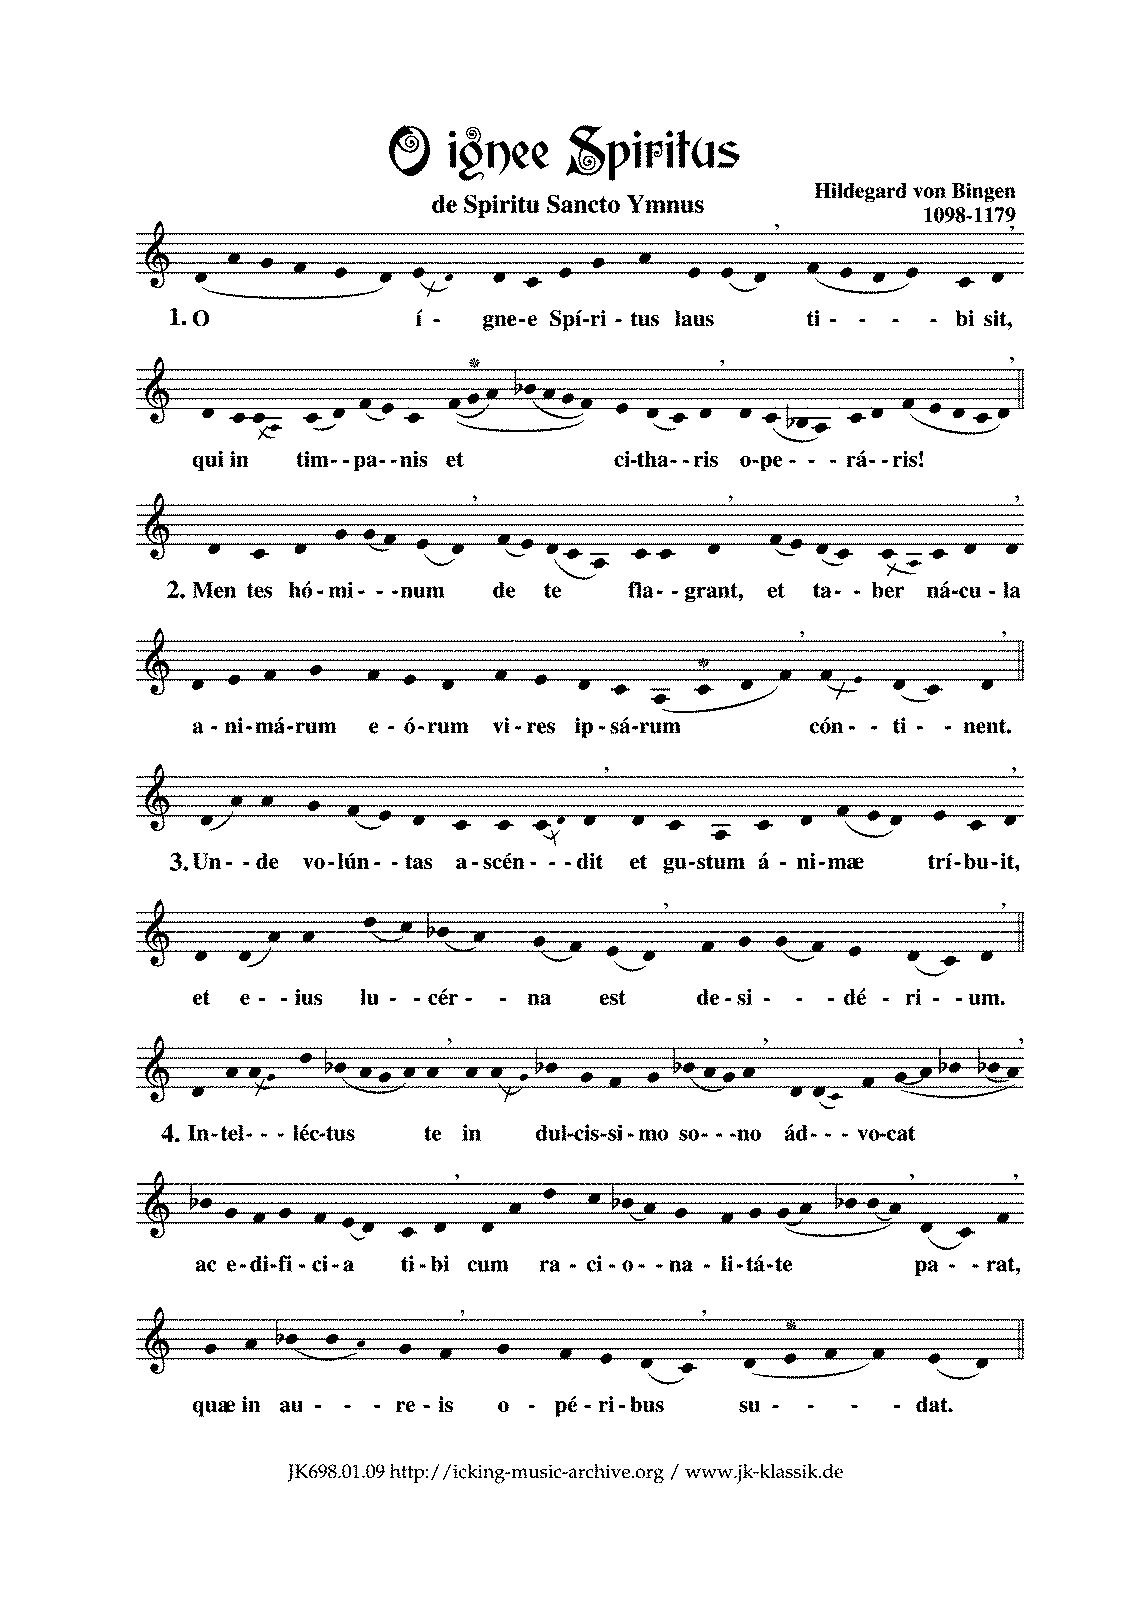 scivias hildegarde de bingen pdf